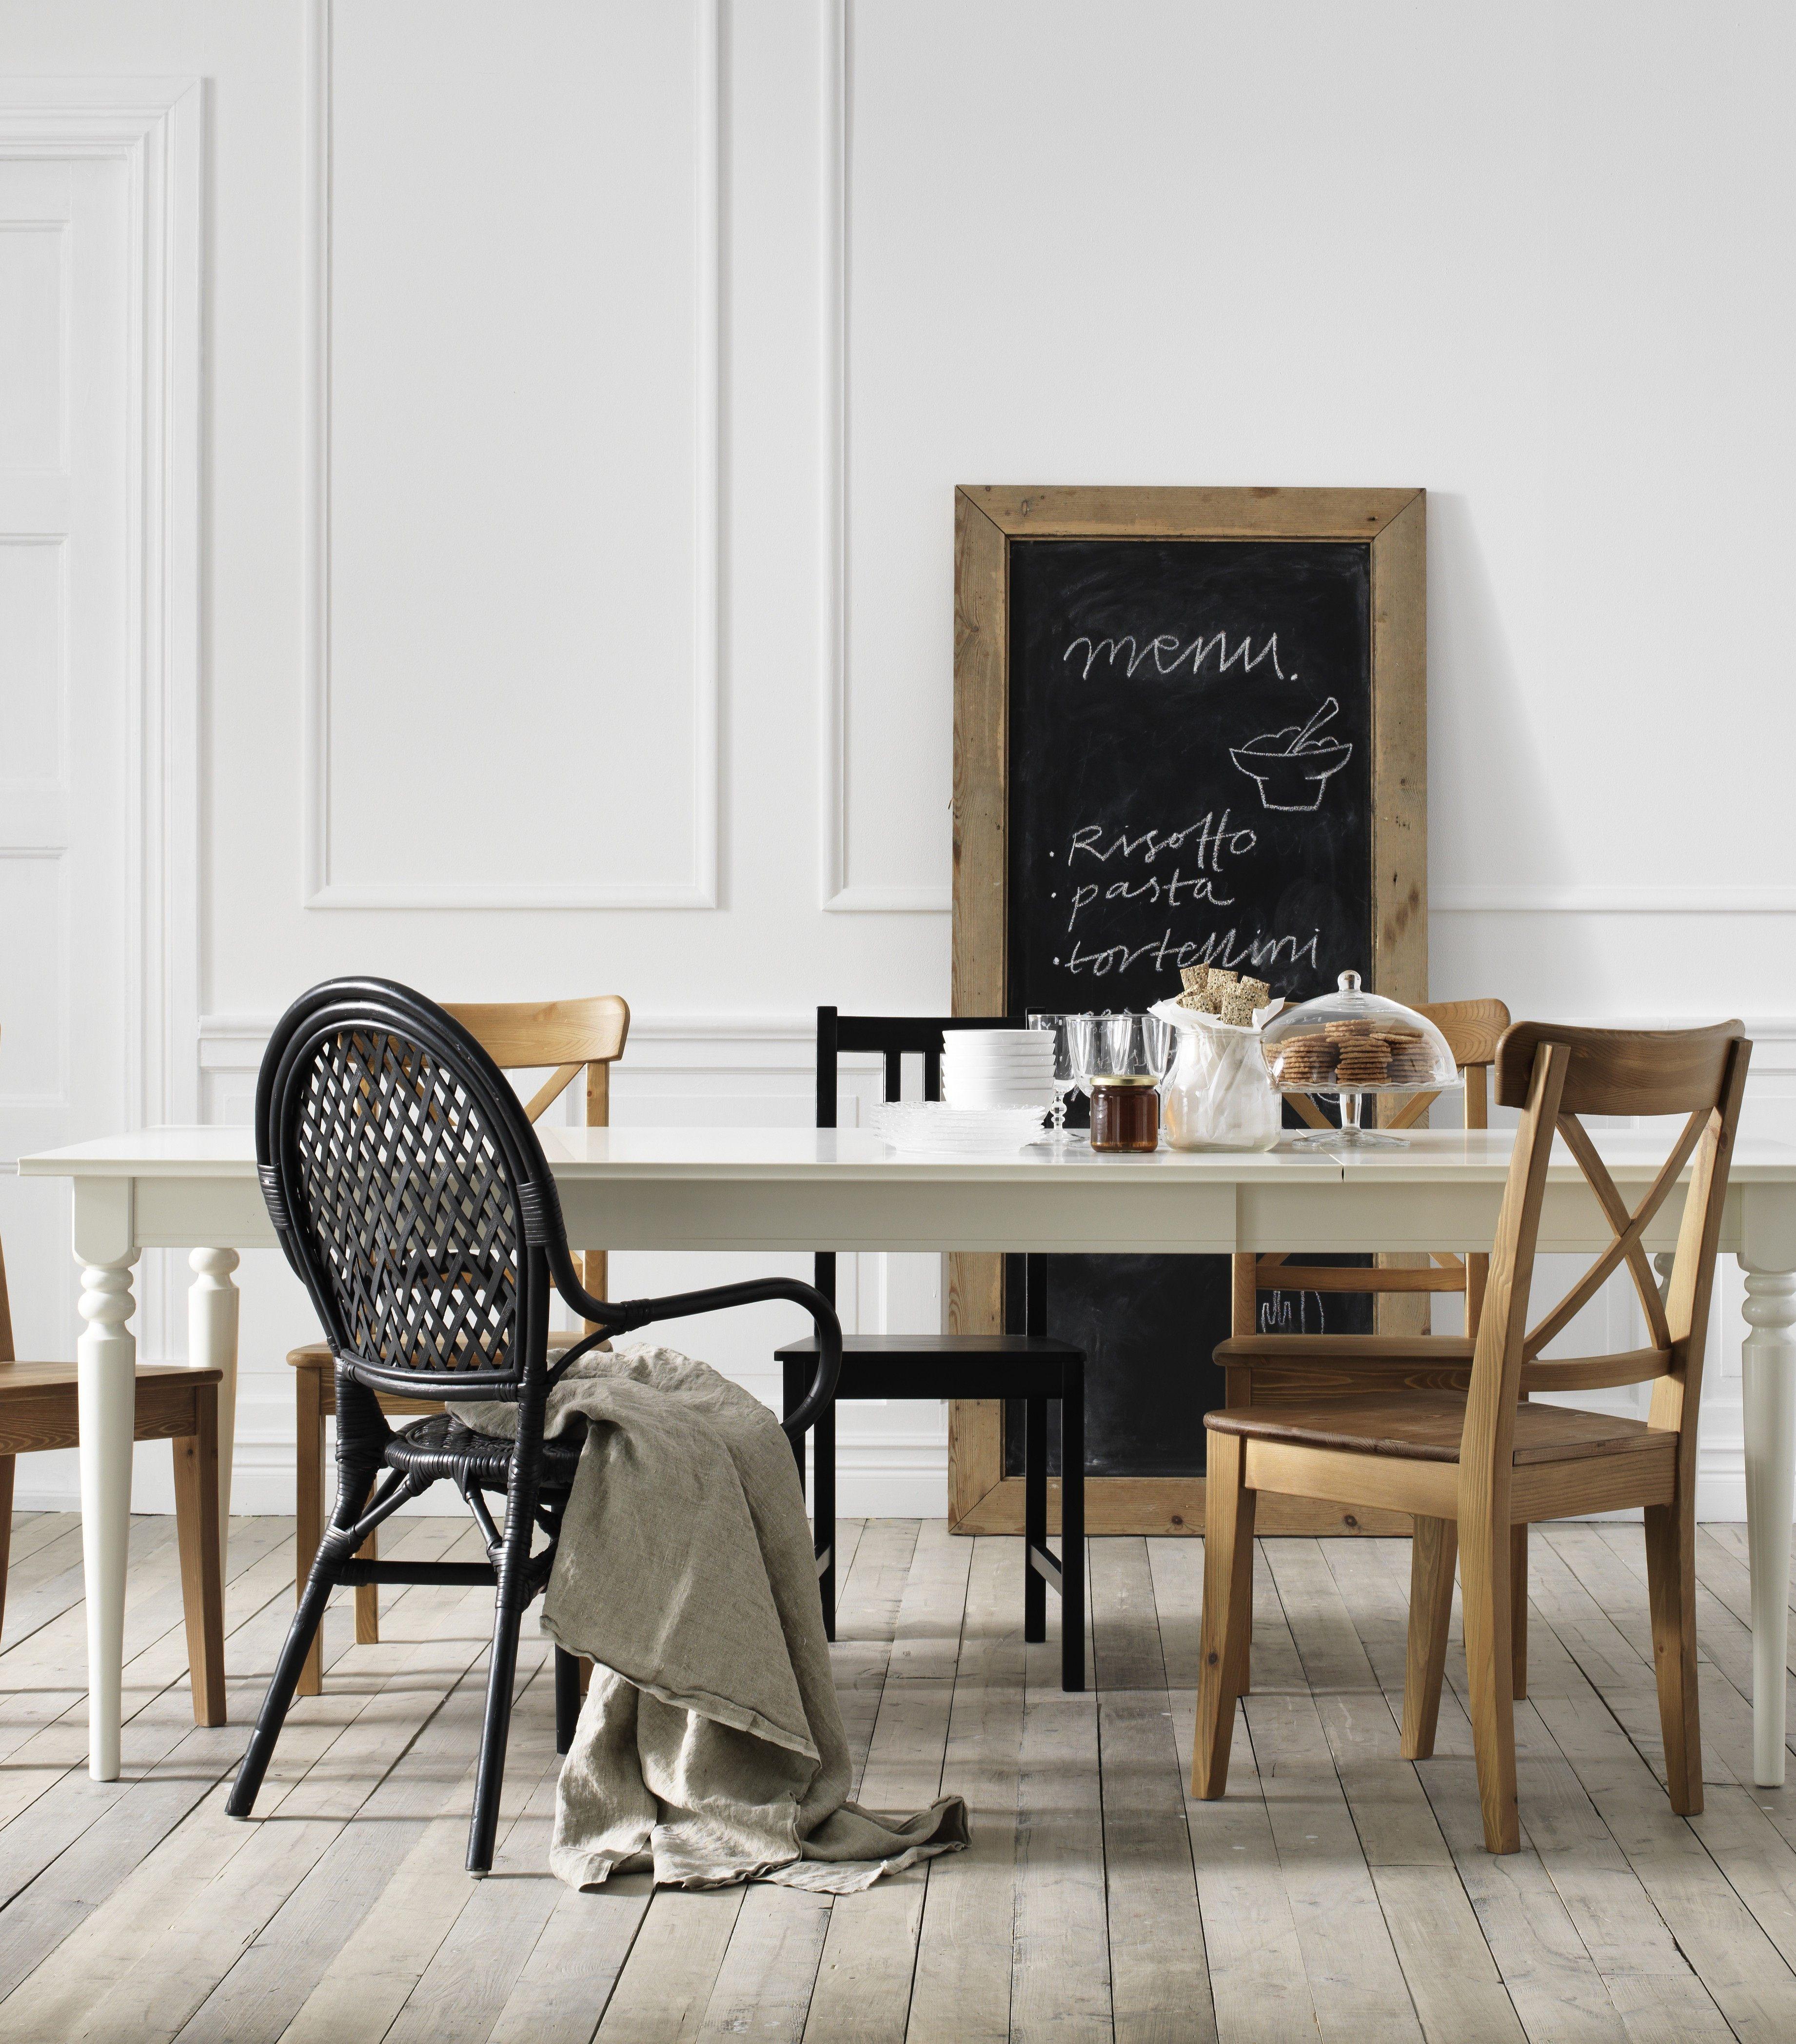 Ikea Lit Extensible Unique Remarquable Table Salle A Manger Ikea Et Interesting Metal Dining